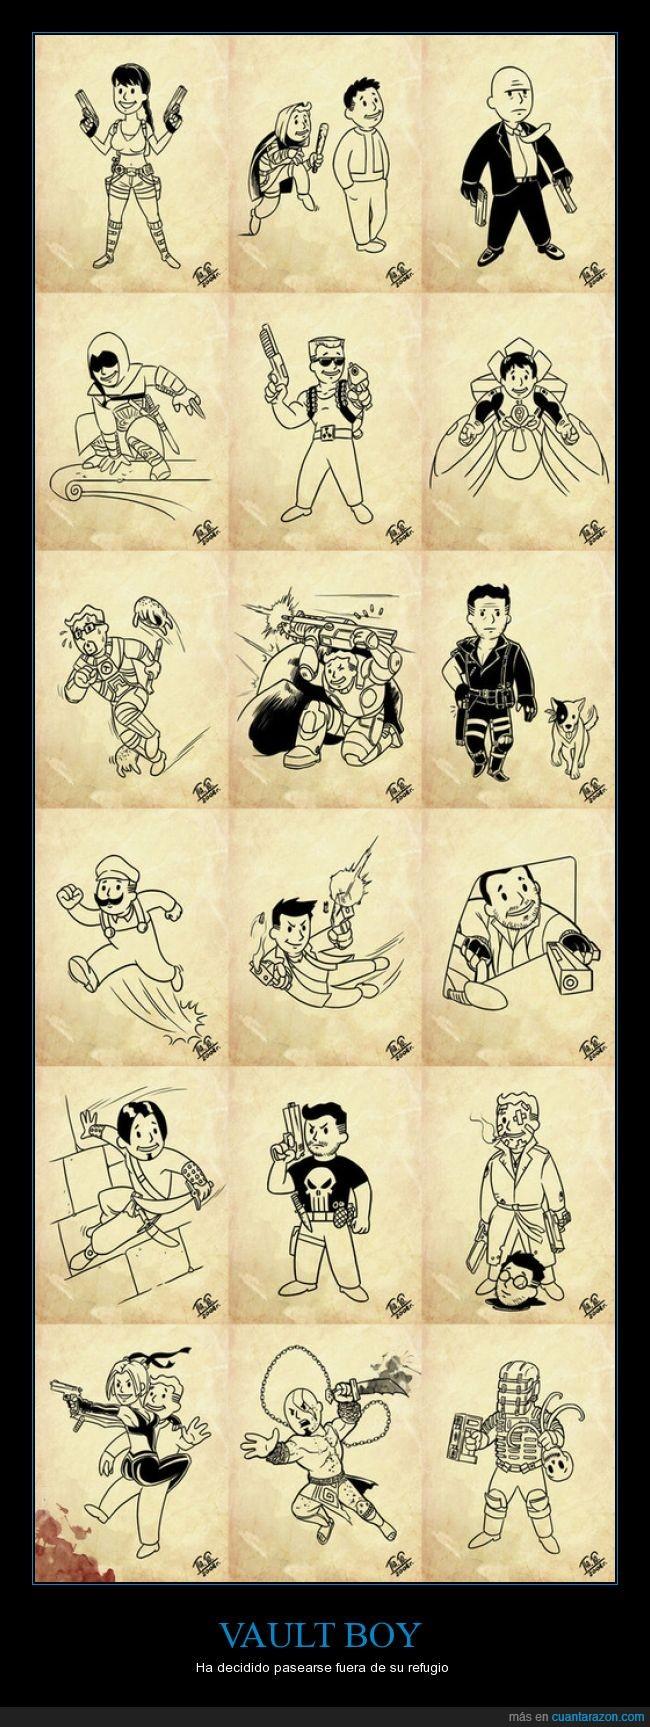 boy,Dead Space,gamer,hitman,Isaac Clark,Kratos,Lara Croft,personaje,Prince of persia,Quake,vault,Vault boy,Vaultboy,videojuego